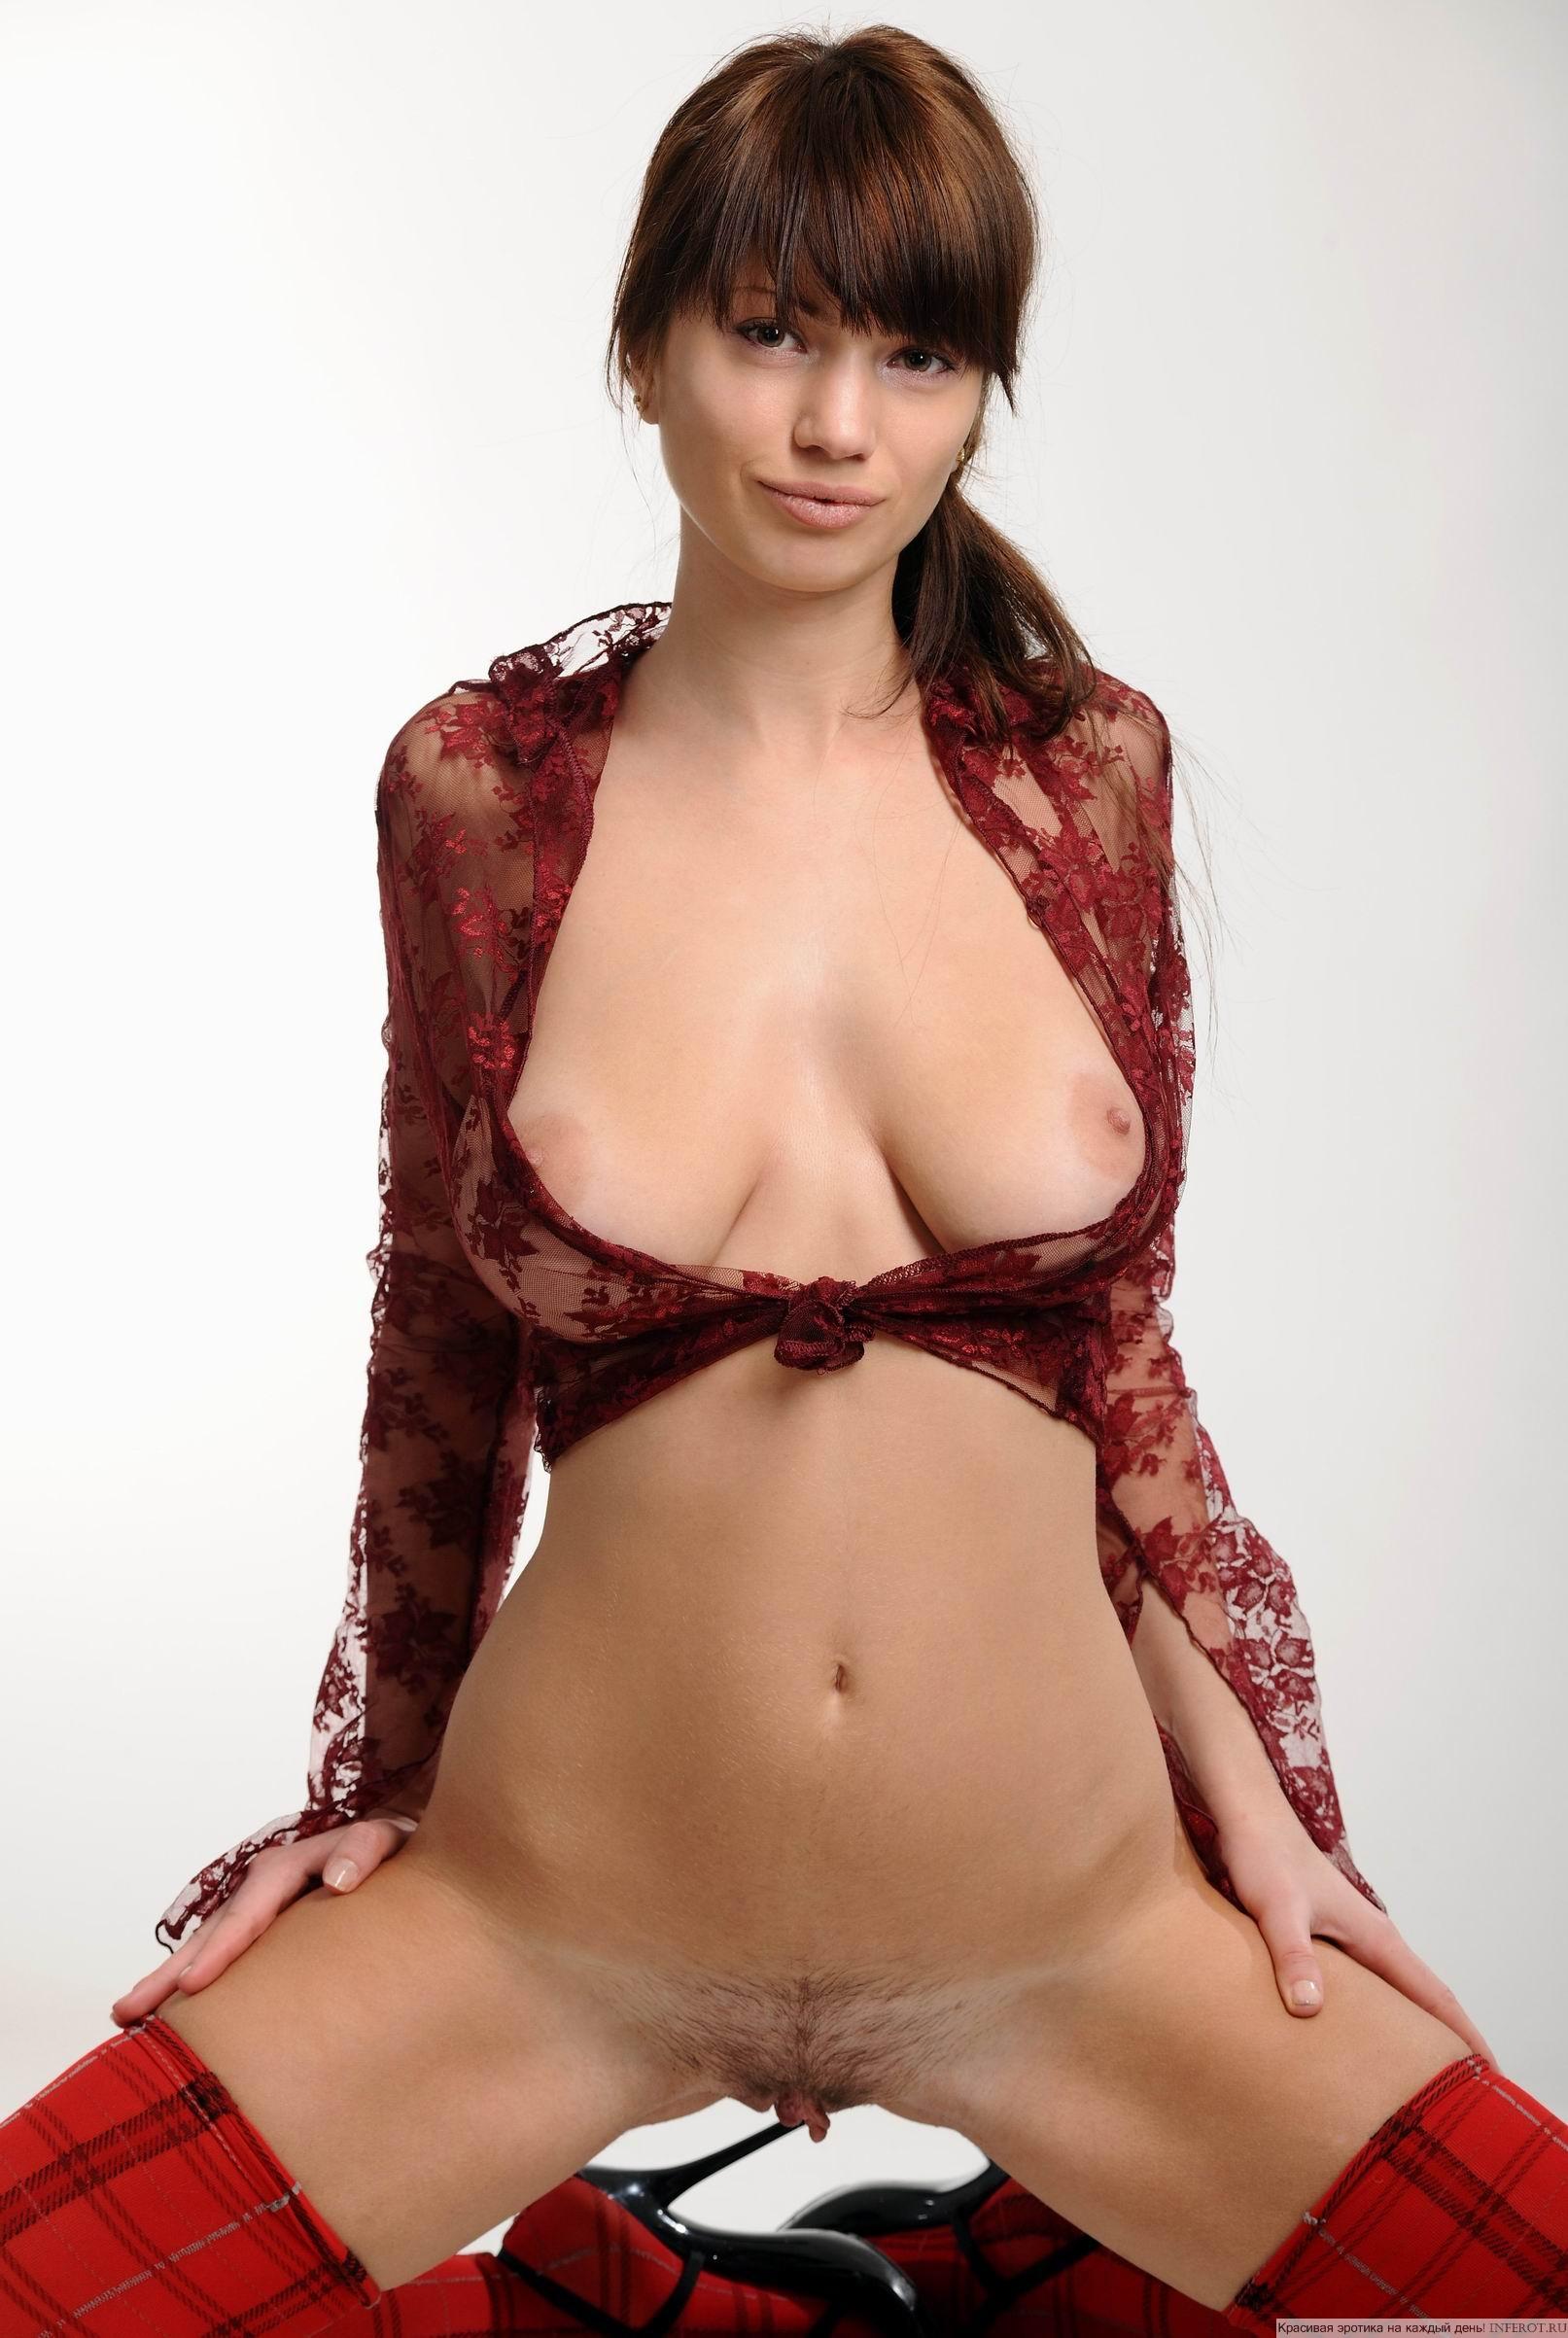 Фото прозрачных блузках эротика 11 фотография